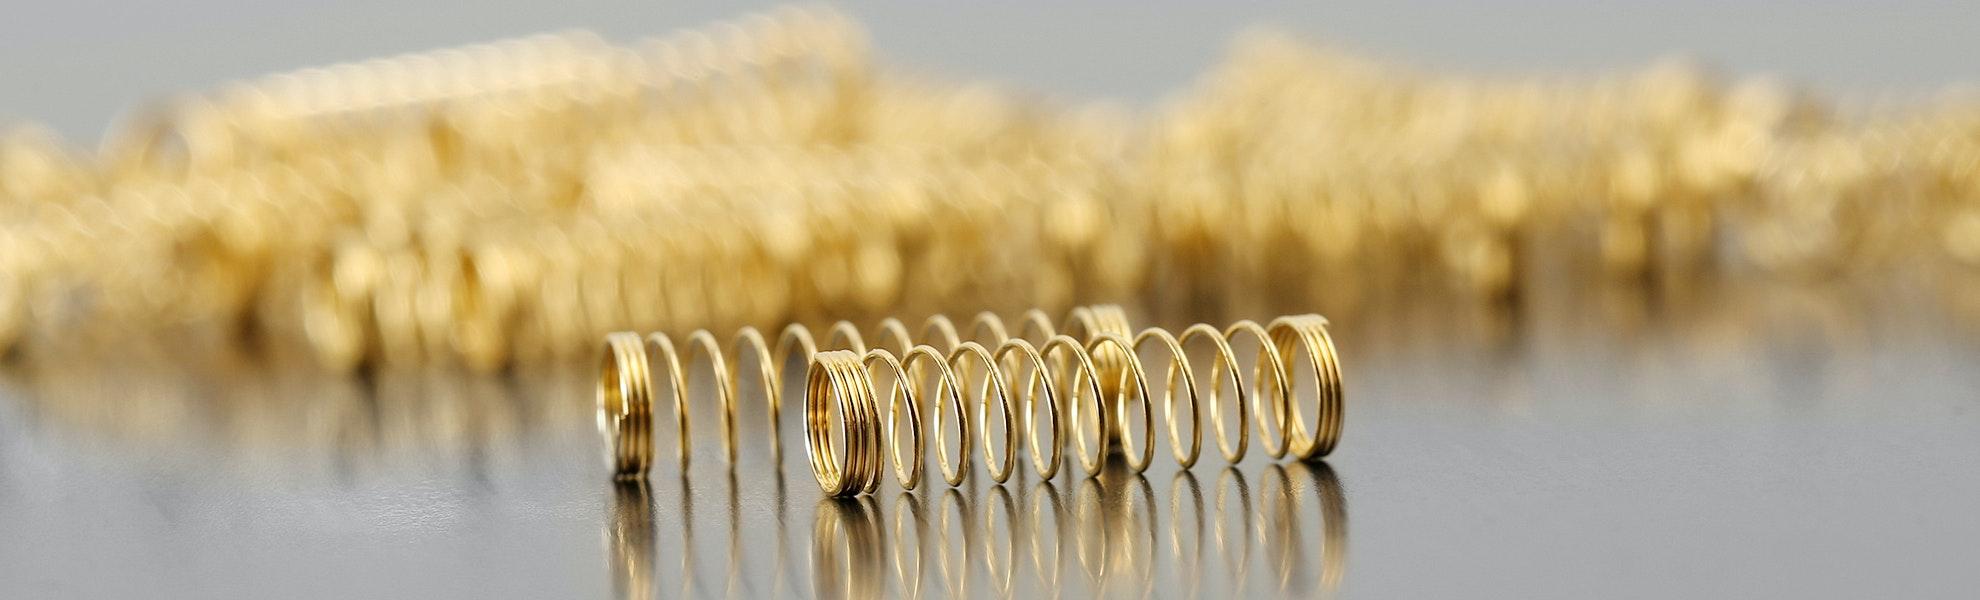 SPRiT 24K Gold-Plated Cherry MX Springs (100pcs)